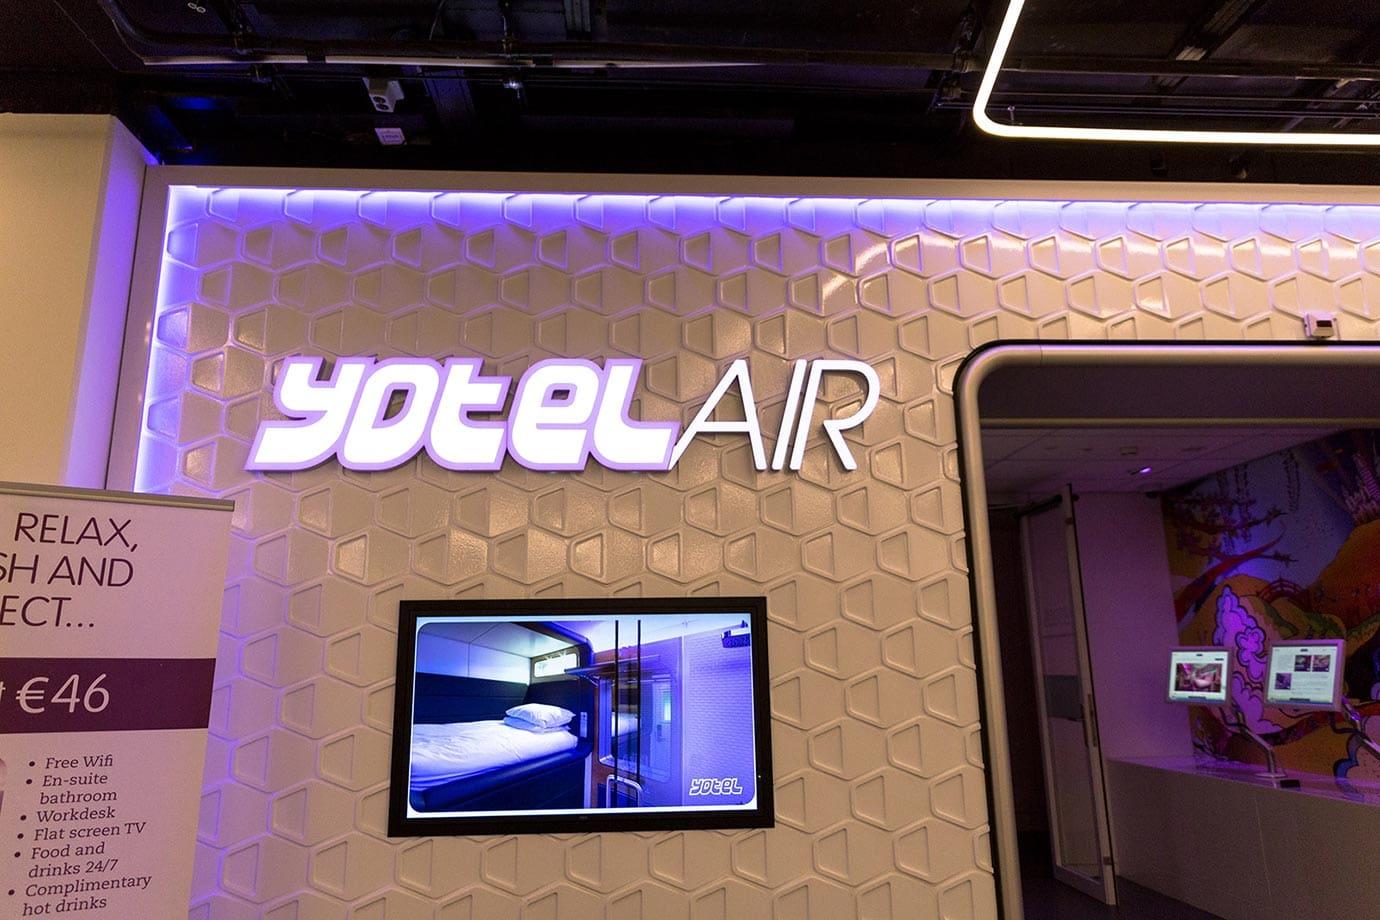 Yotel Air, Schiphol Airport